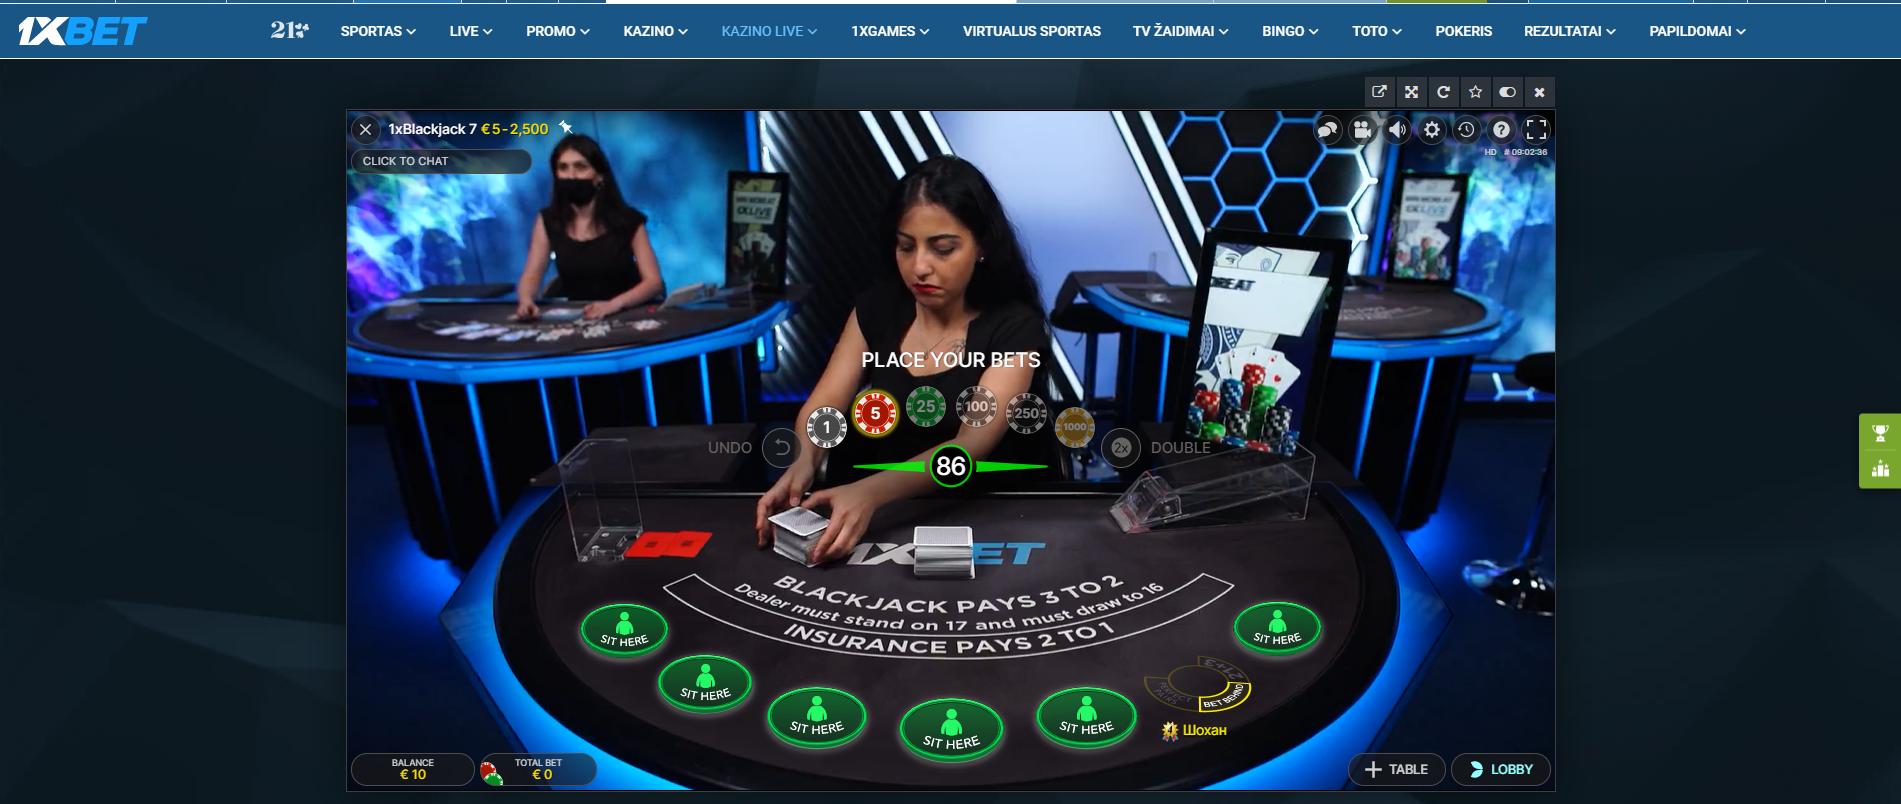 1xcasino 1xbet live kazino dalintojas krupjė blackjack stalas